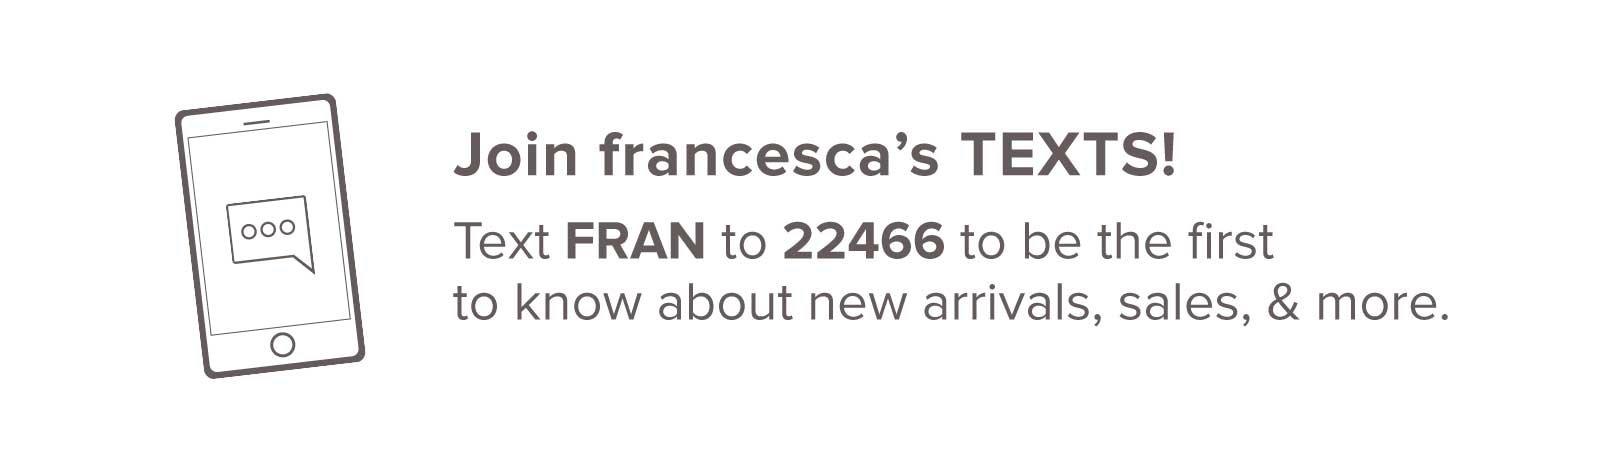 Join francesca's TEXTS!